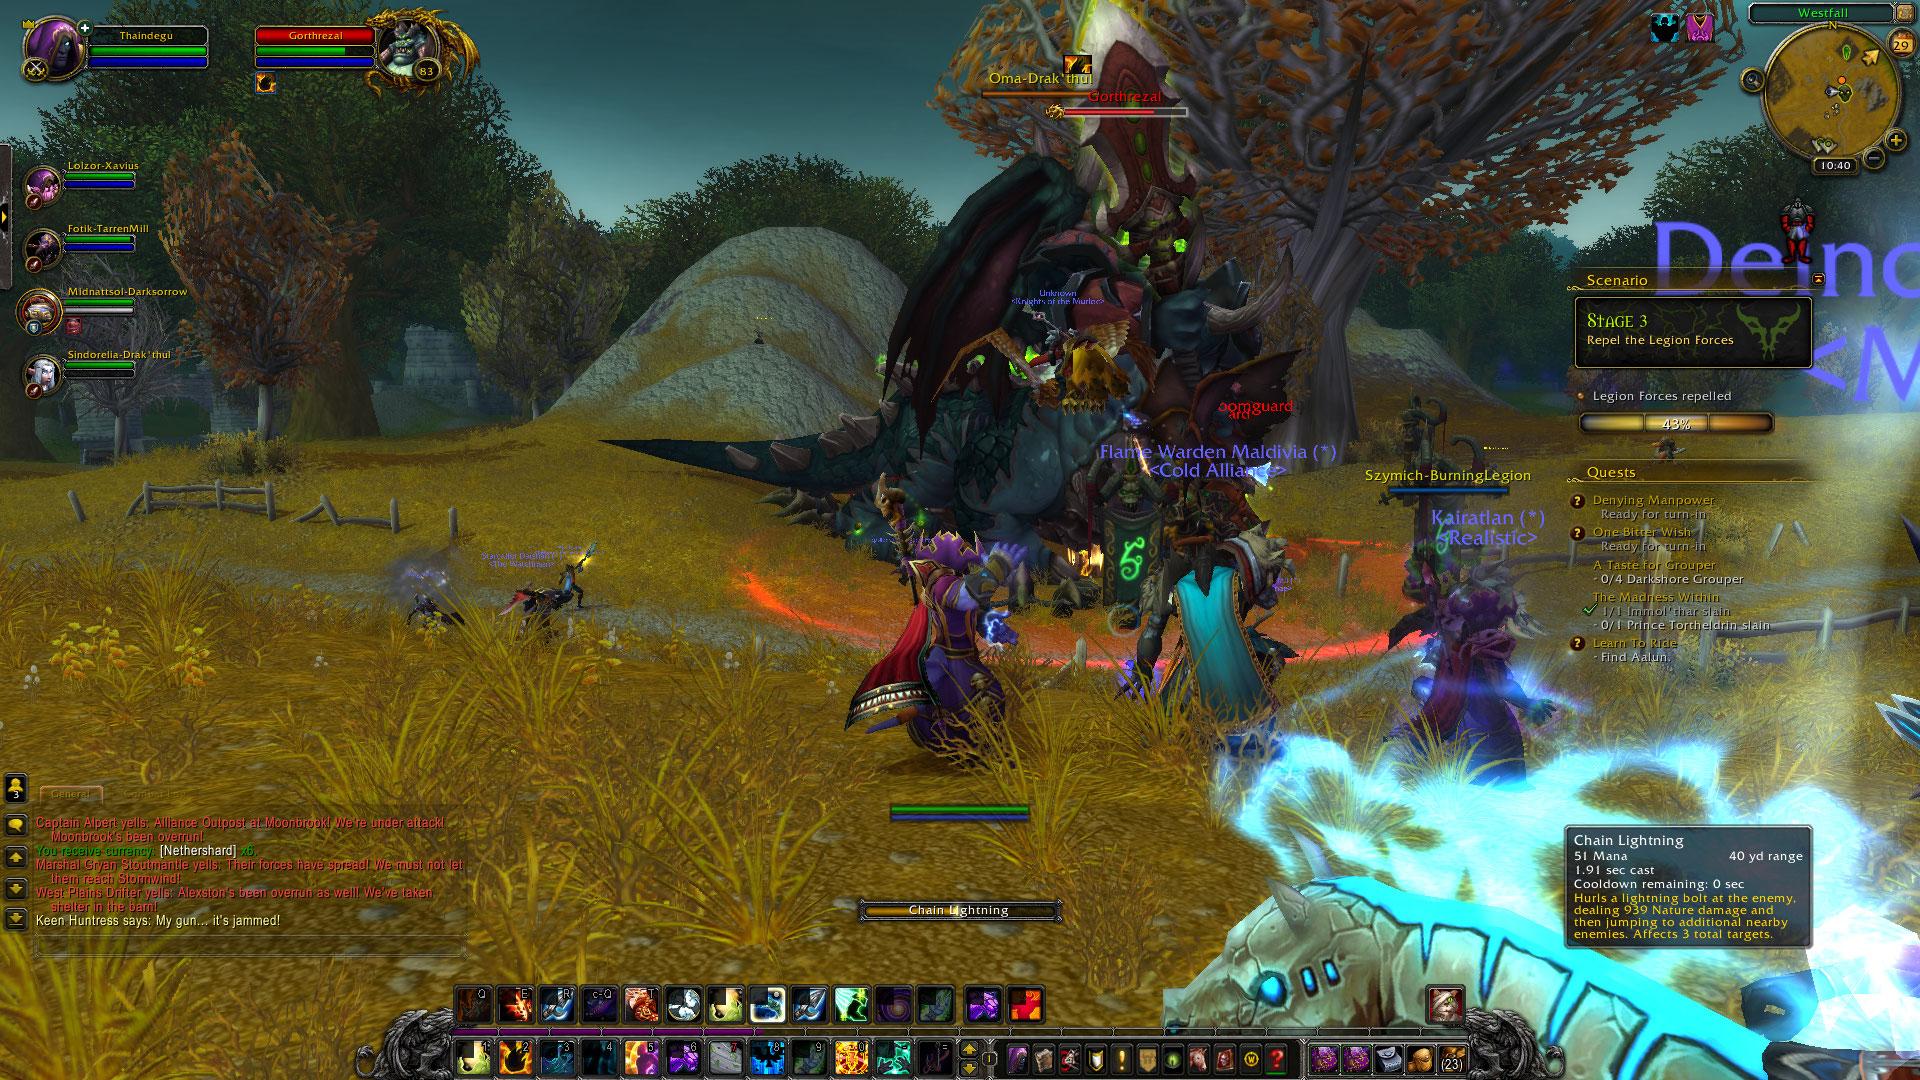 World of Warcraft: Legion fotoseriál - Plamenná legie přichází 129820